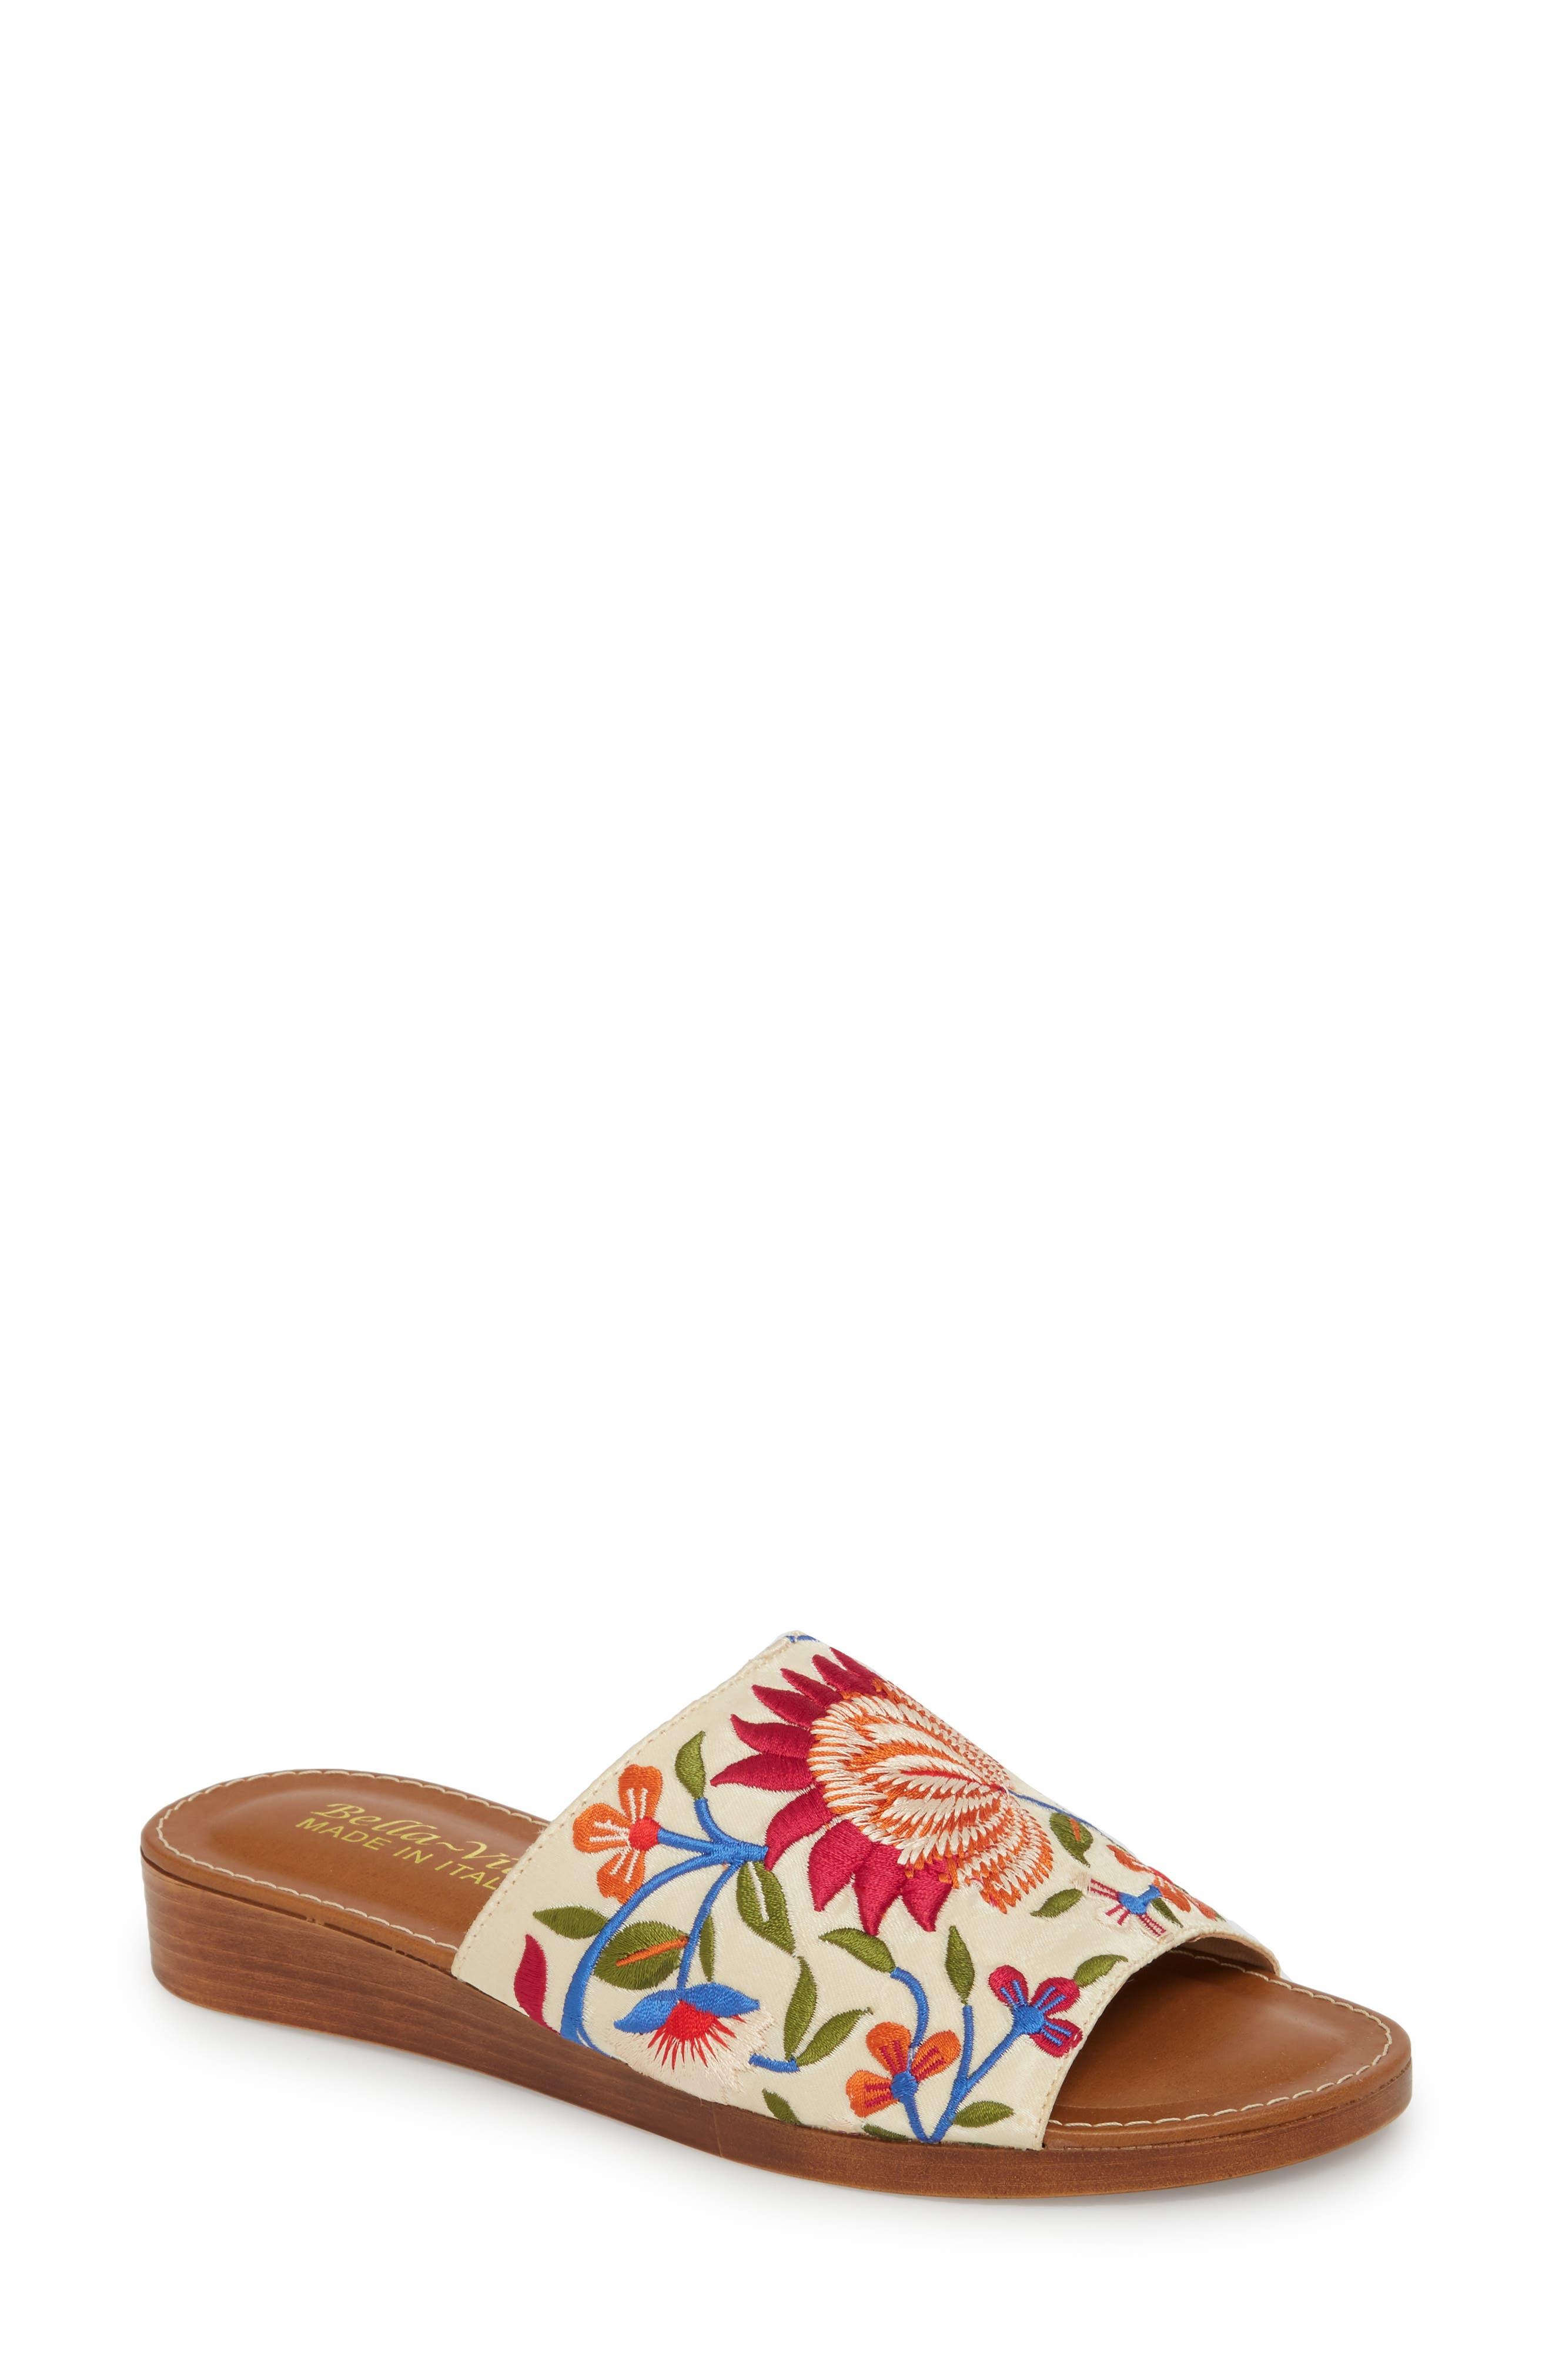 Abi Slide Sandal,                         Main,                         color, Beige Embroidered Fabric